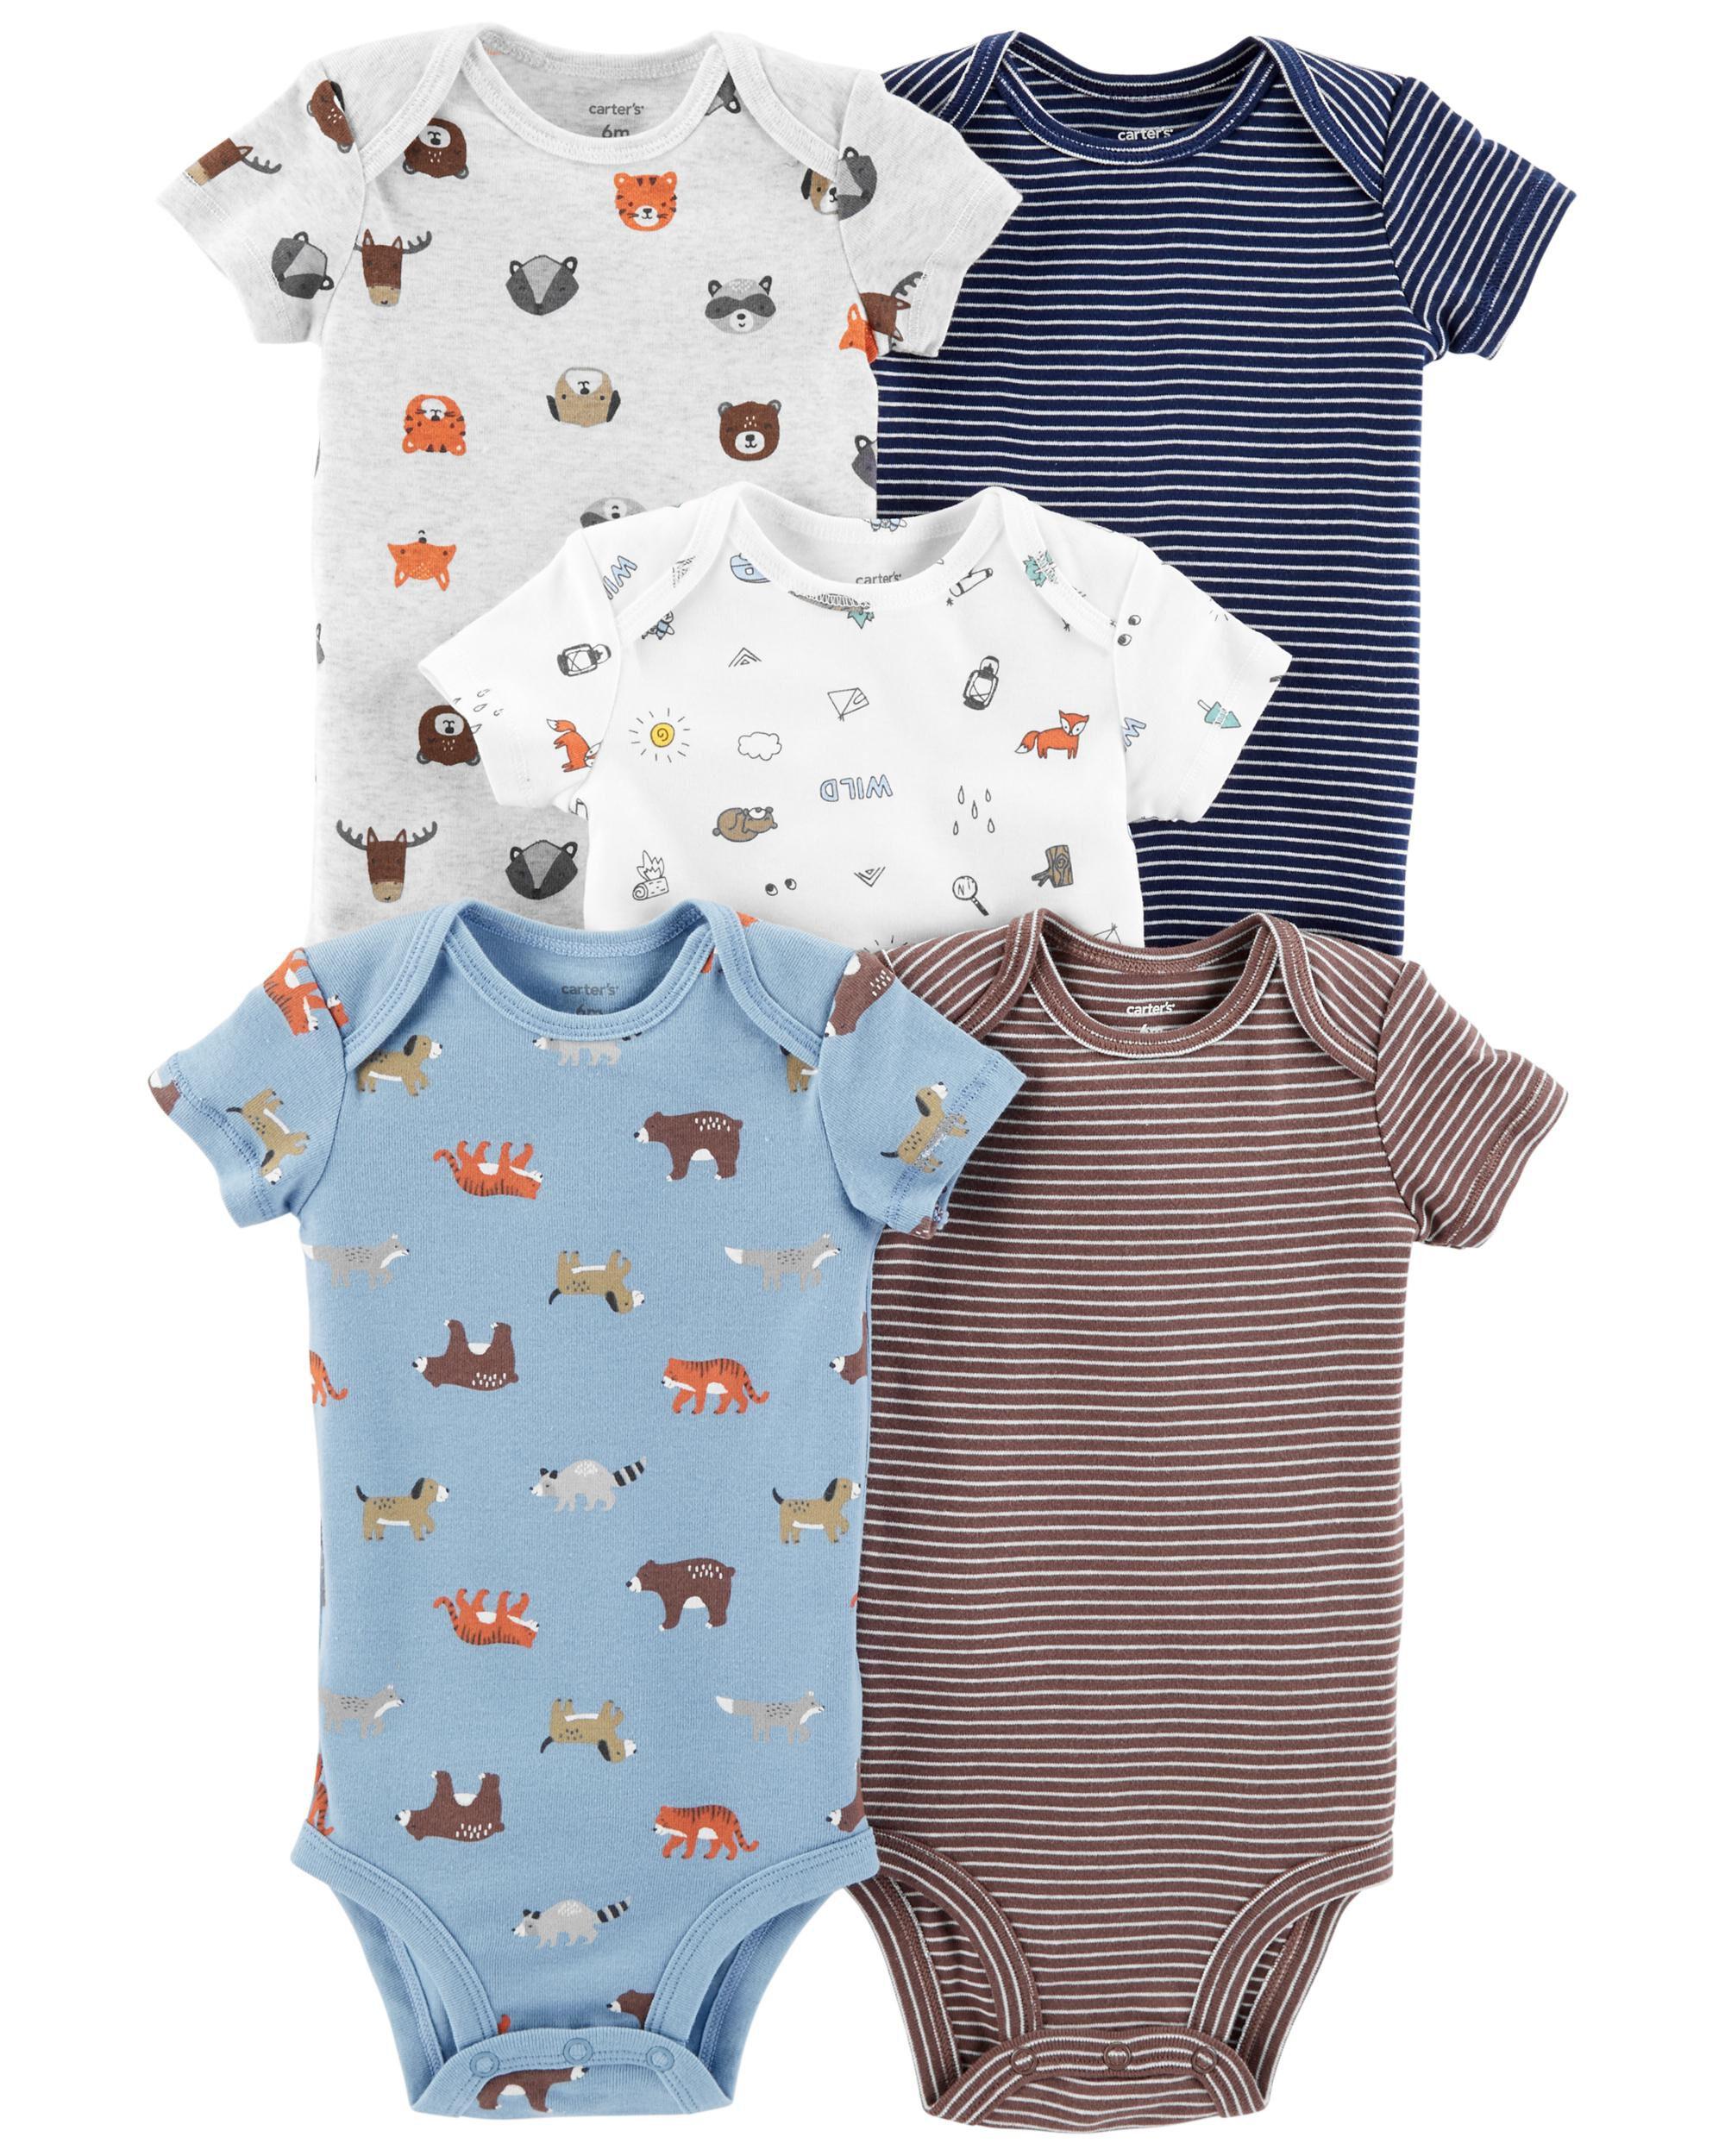 Carters Baby Boy 5-Pack Striped Original Bodysuits